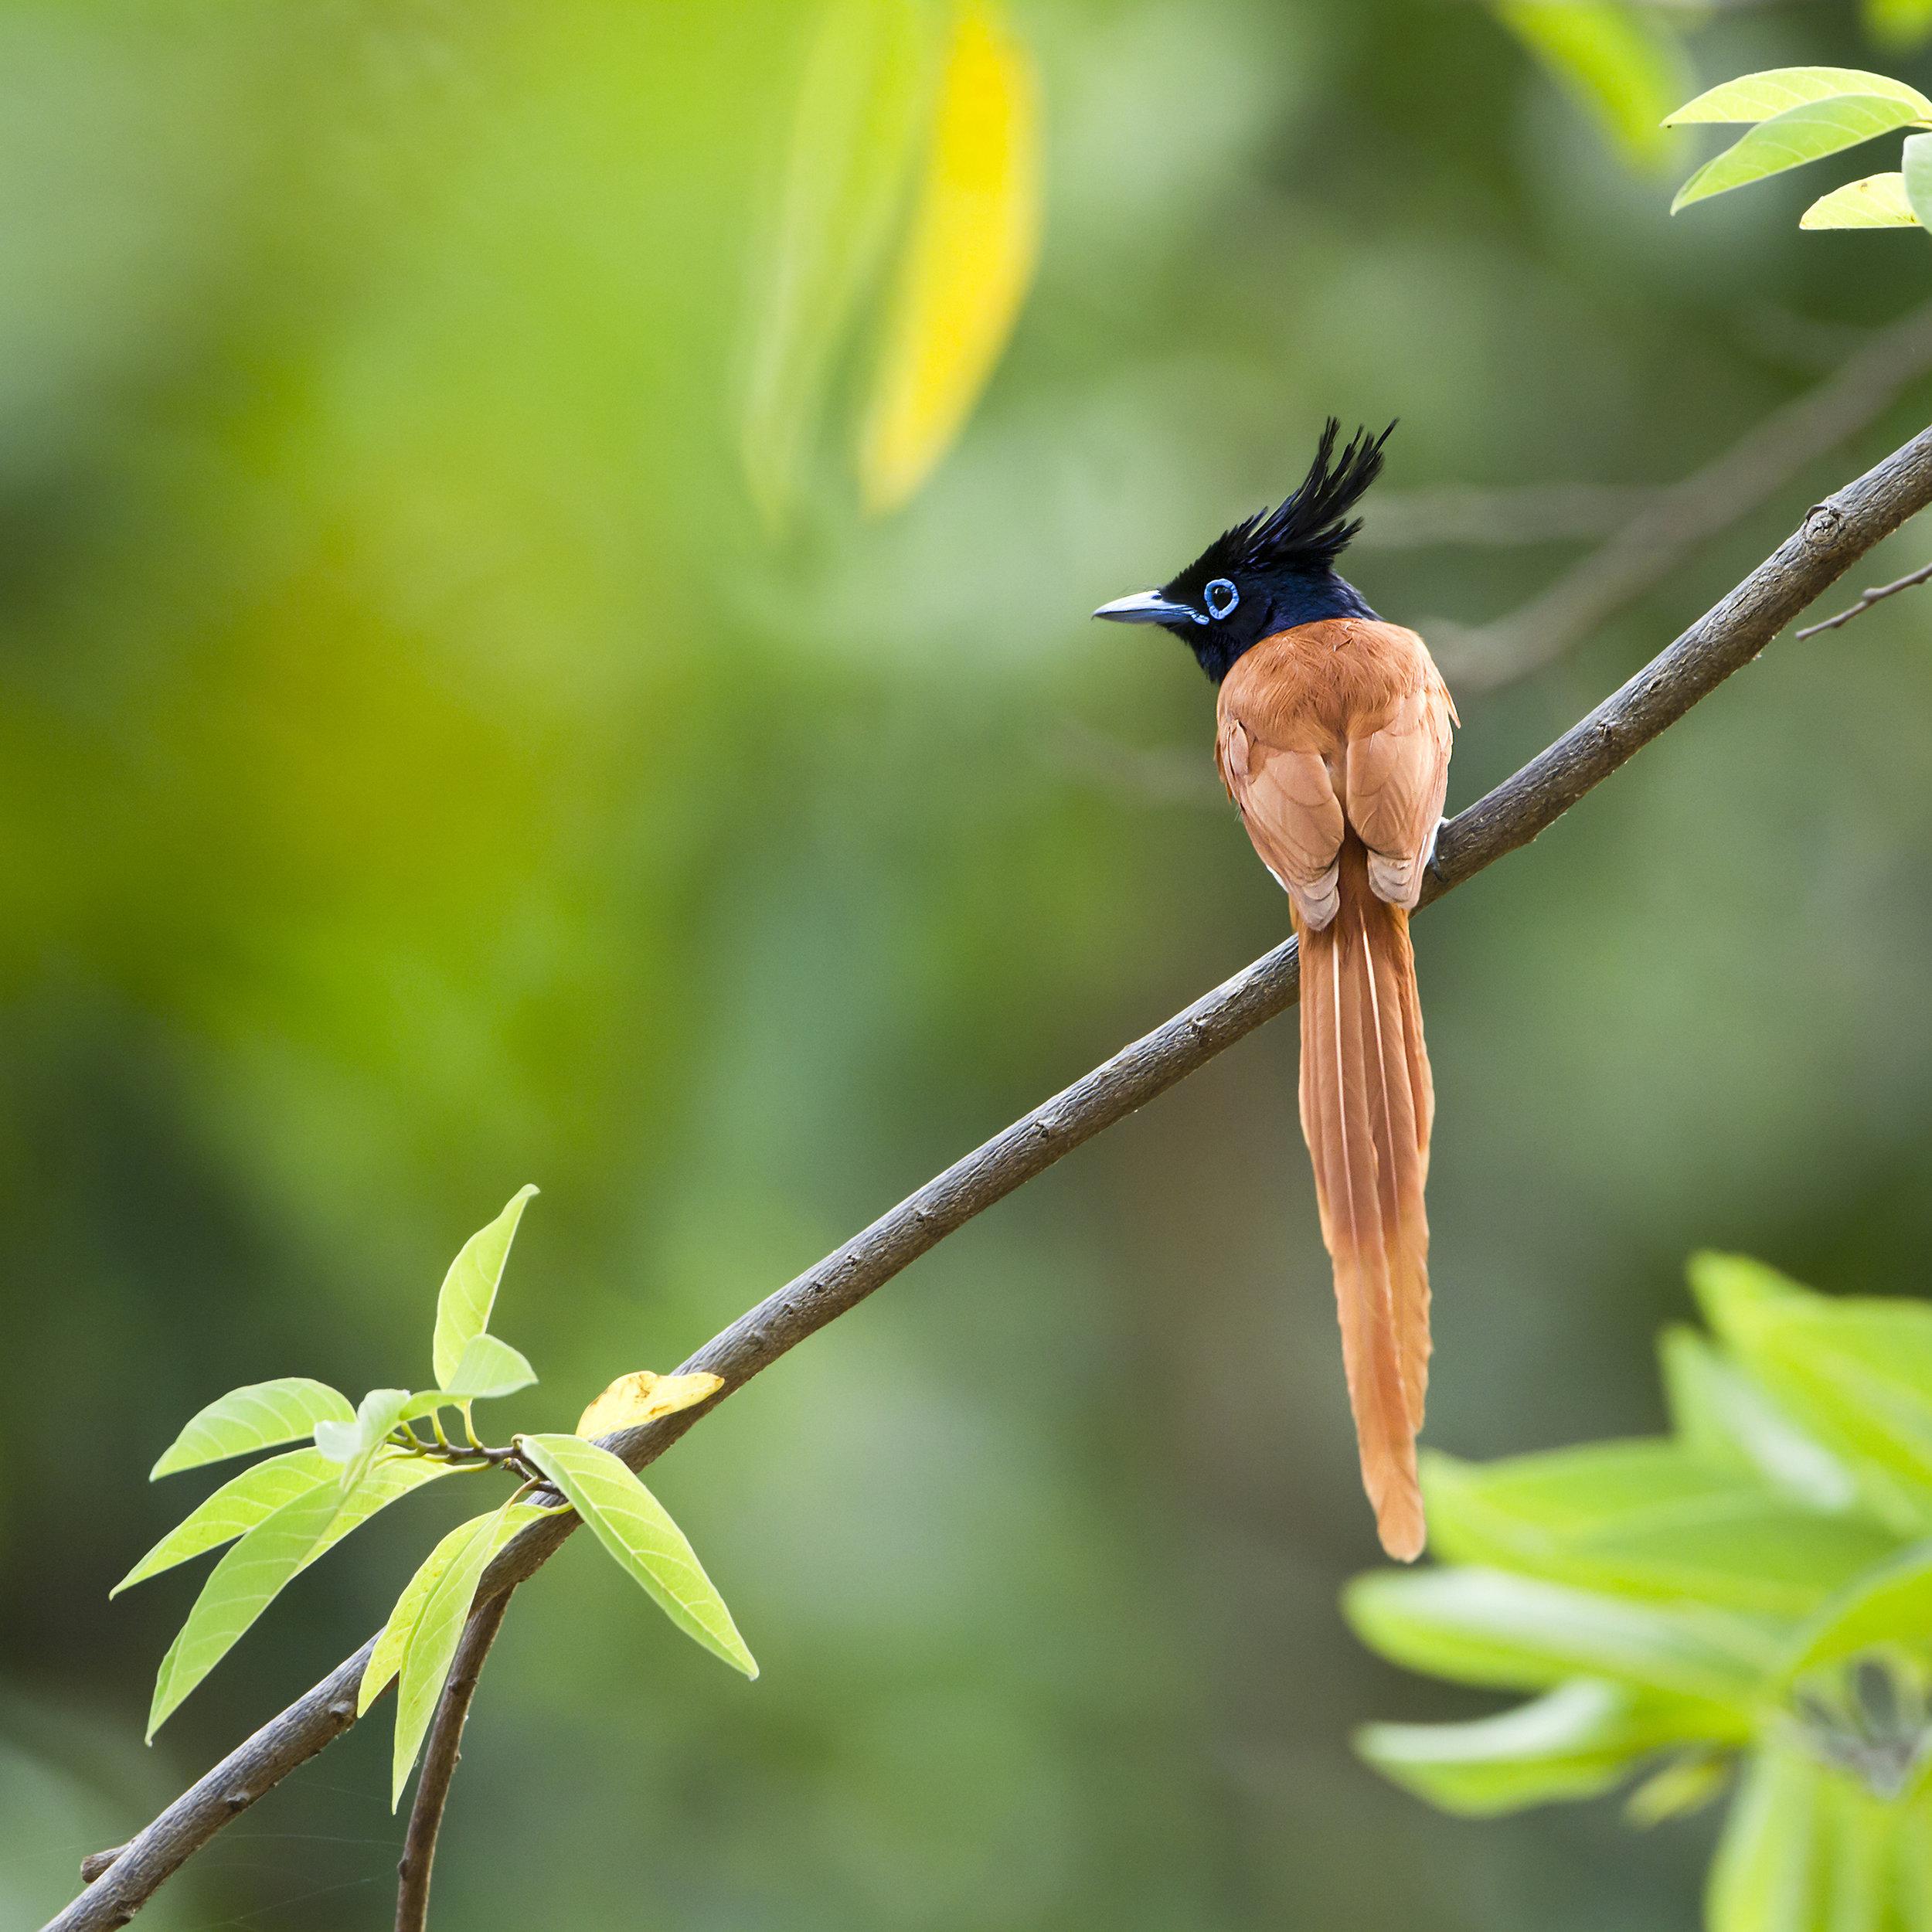 invite-to-paradise-sri-lanka-specialists-experts-travel-agent-tour-operator- 287347139 - Asian paradise flycatcher bird in Sri Lanka ; specie Terpsiphone paradisi.jpg